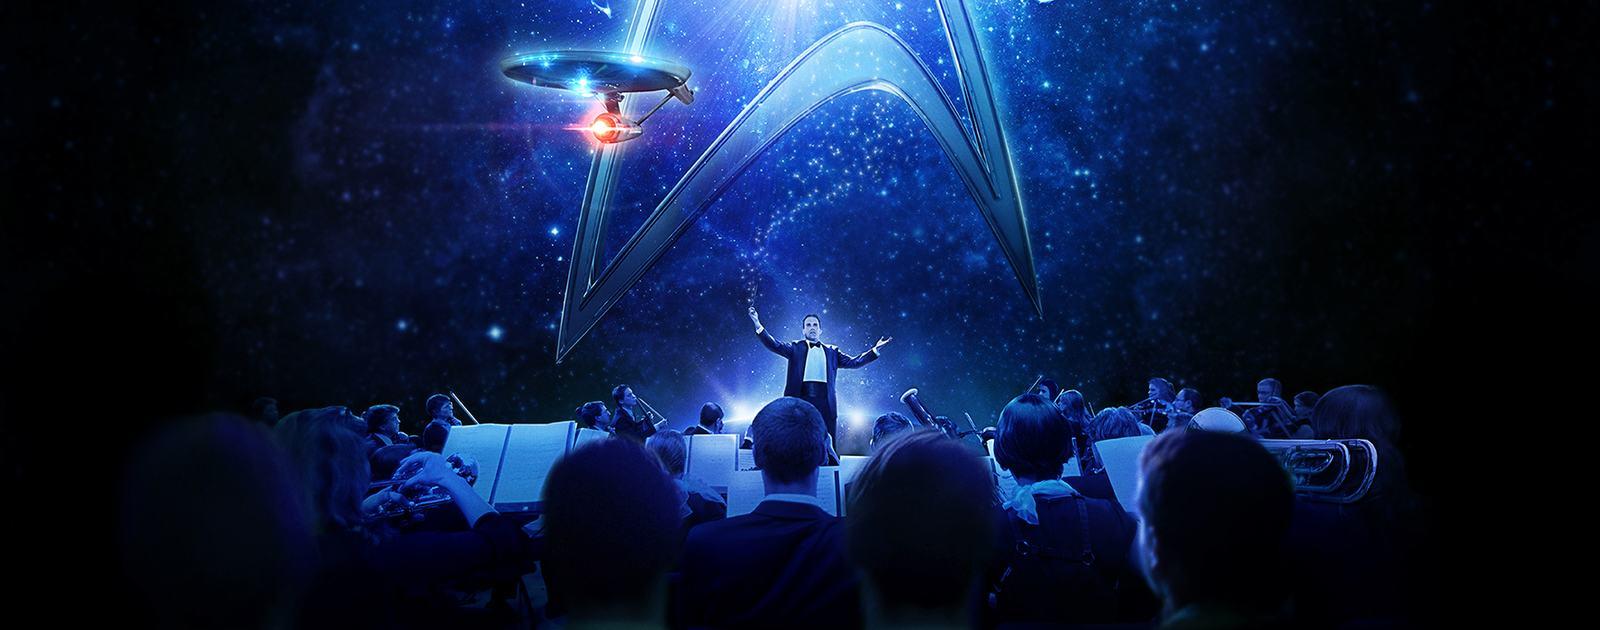 Star Trek with orchestra